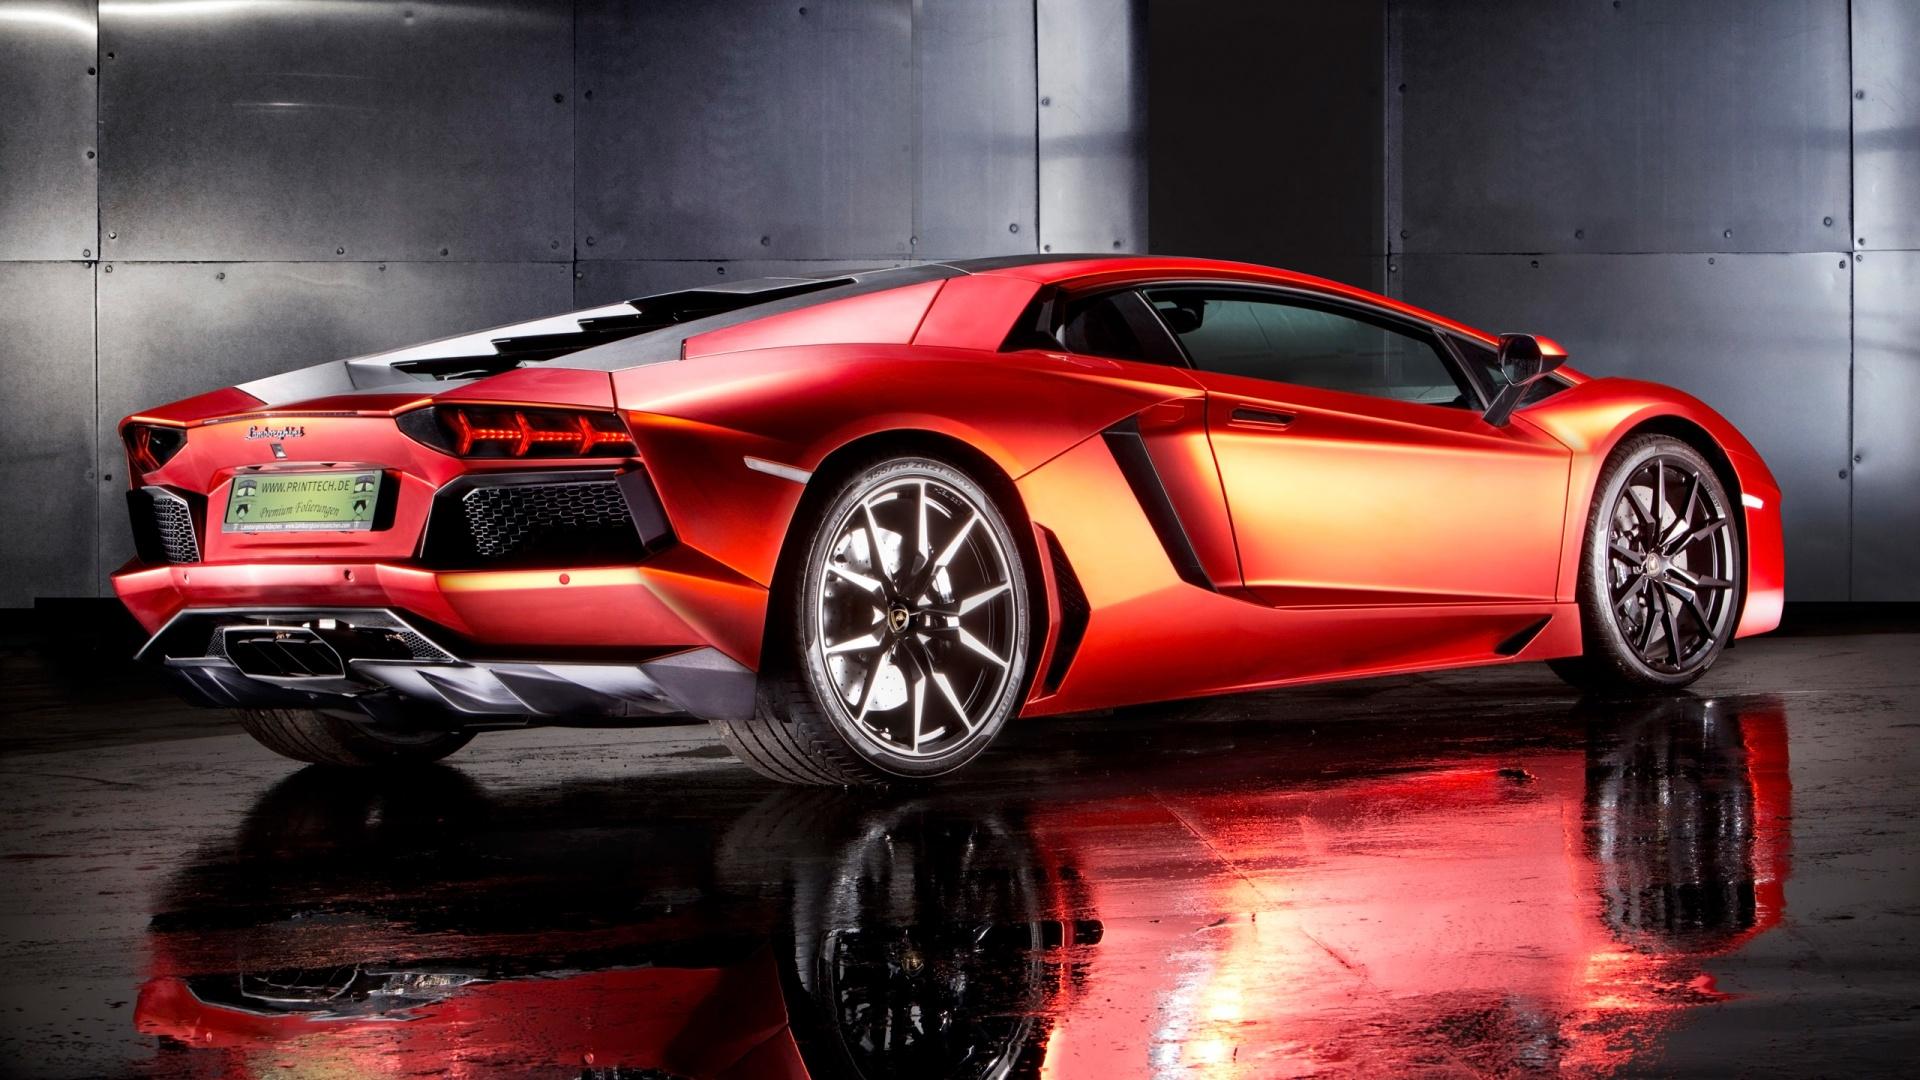 Lamborghini Aventador By Print Tech 2 Wallpaper HD Car Wallpapers 1920x1080